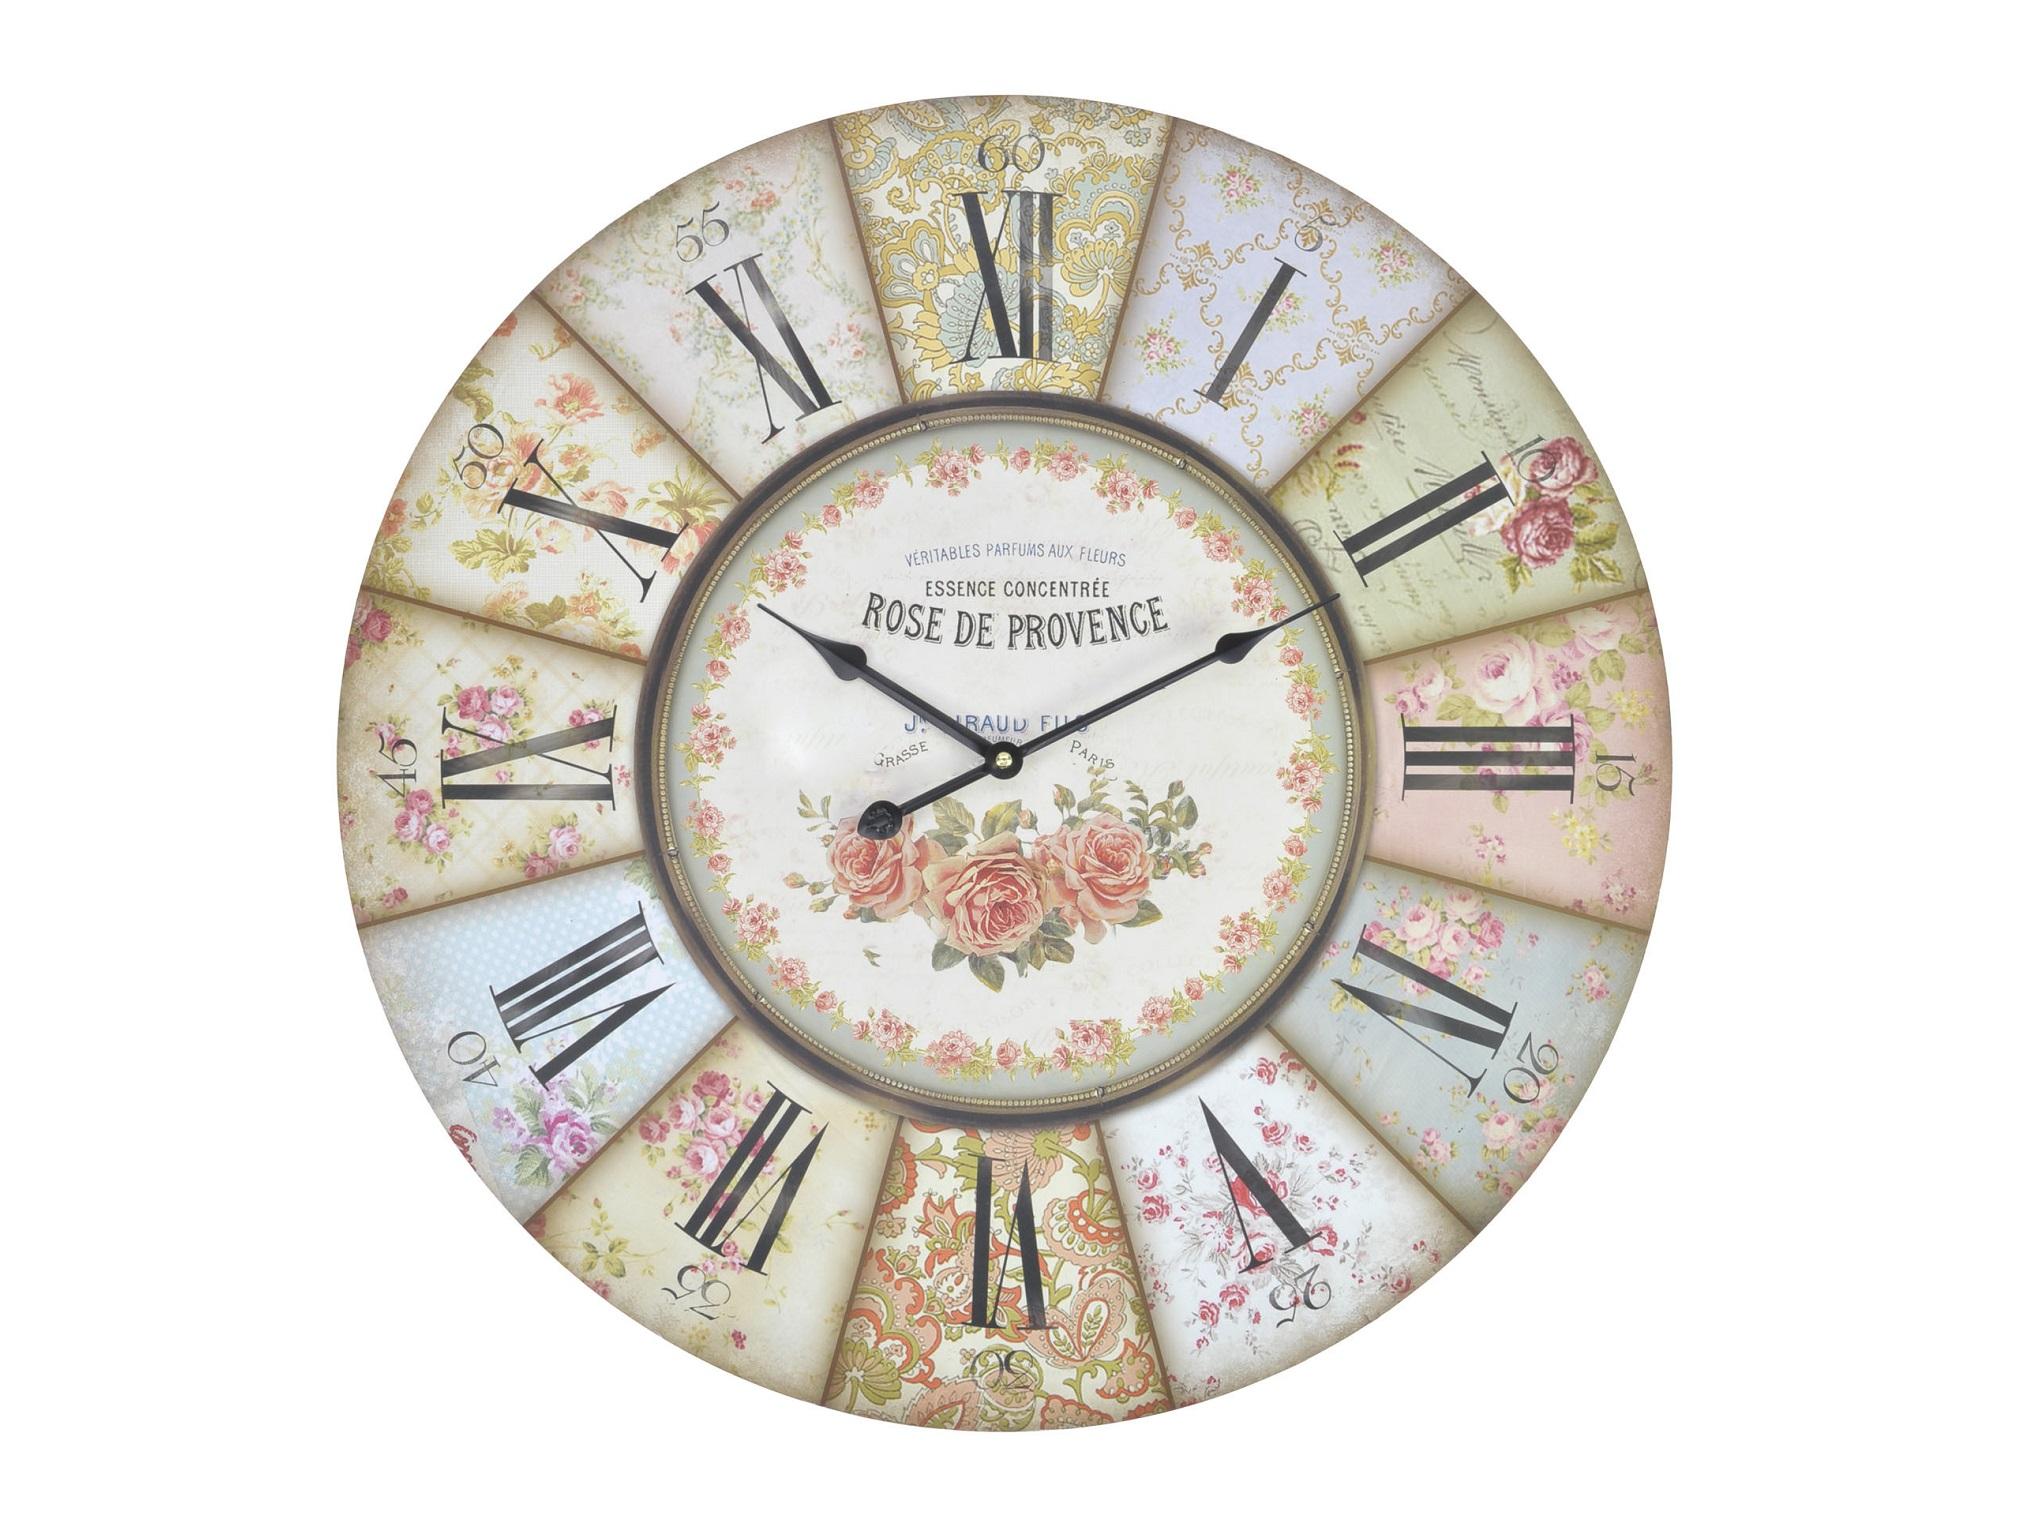 Настенные часы AndreaНастенные часы<br>Кварцевый механизм<br><br>Material: Дерево<br>Глубина см: 4.0